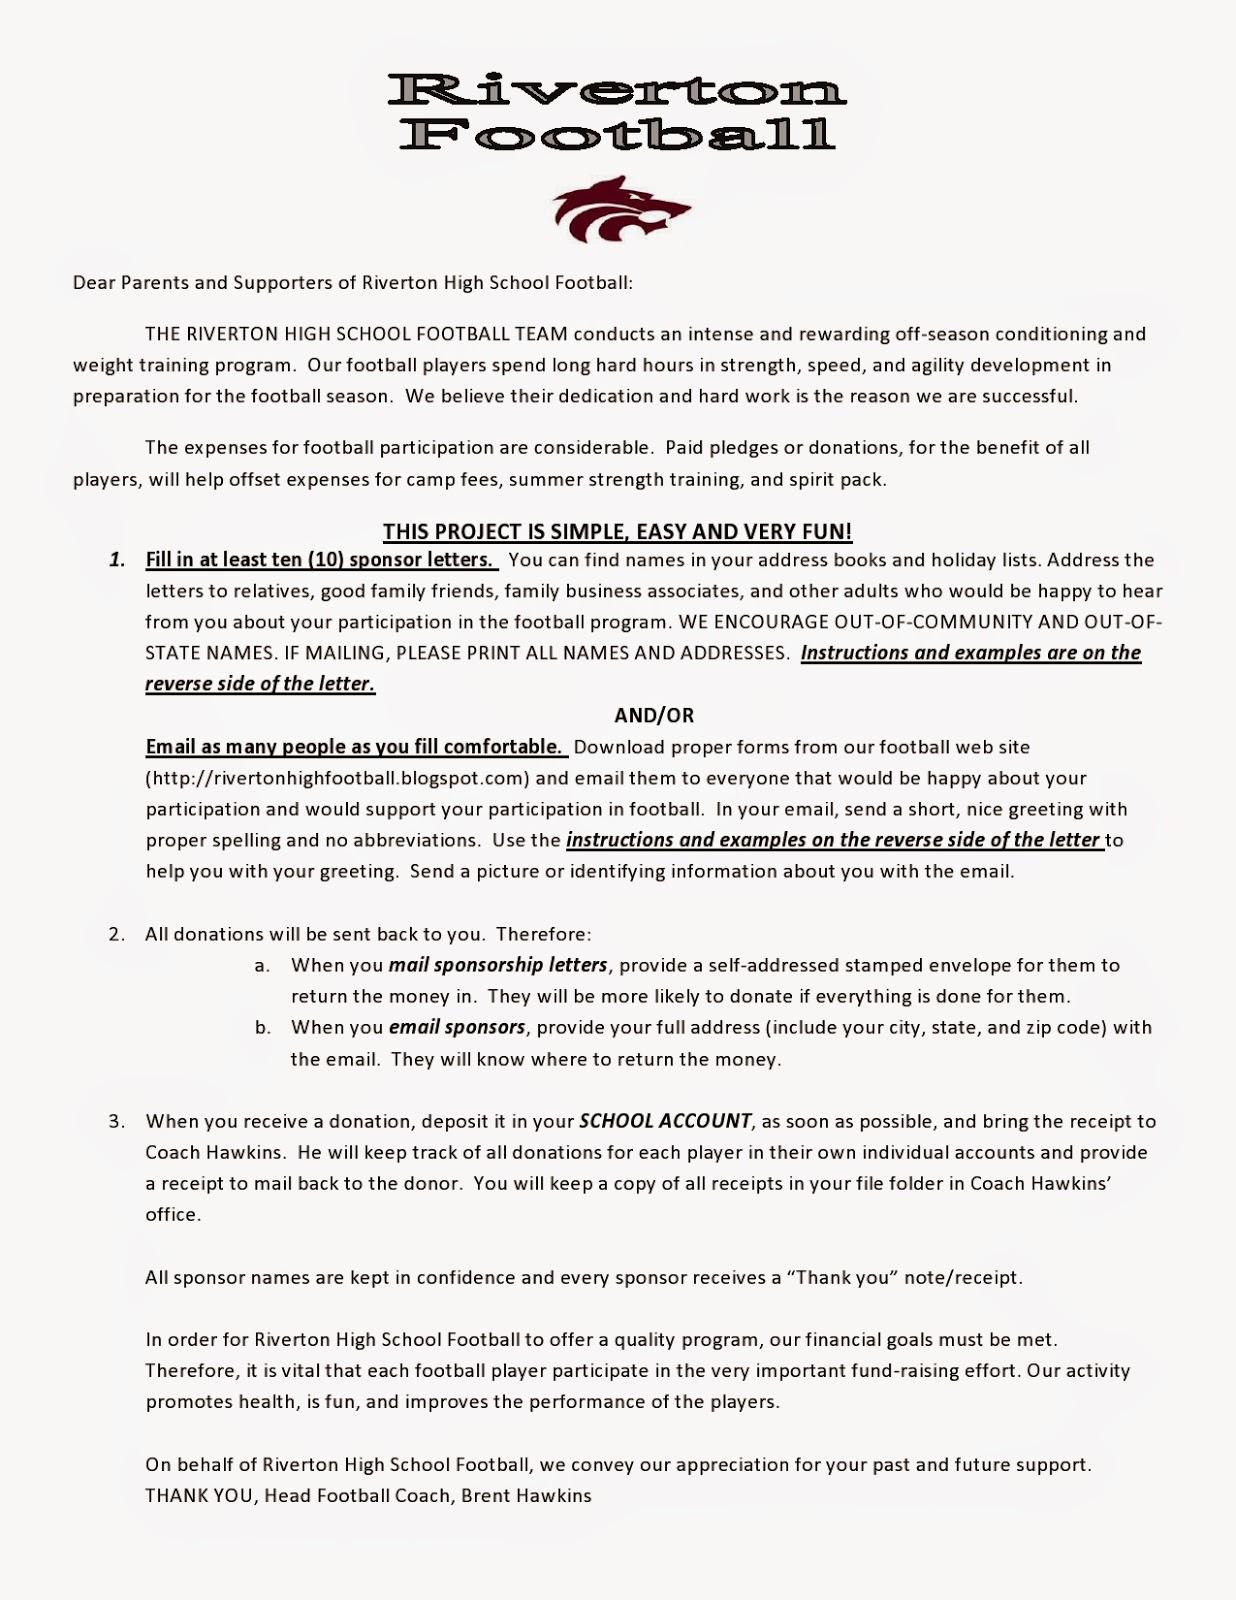 high school football program template - fundraising letter for high school sports